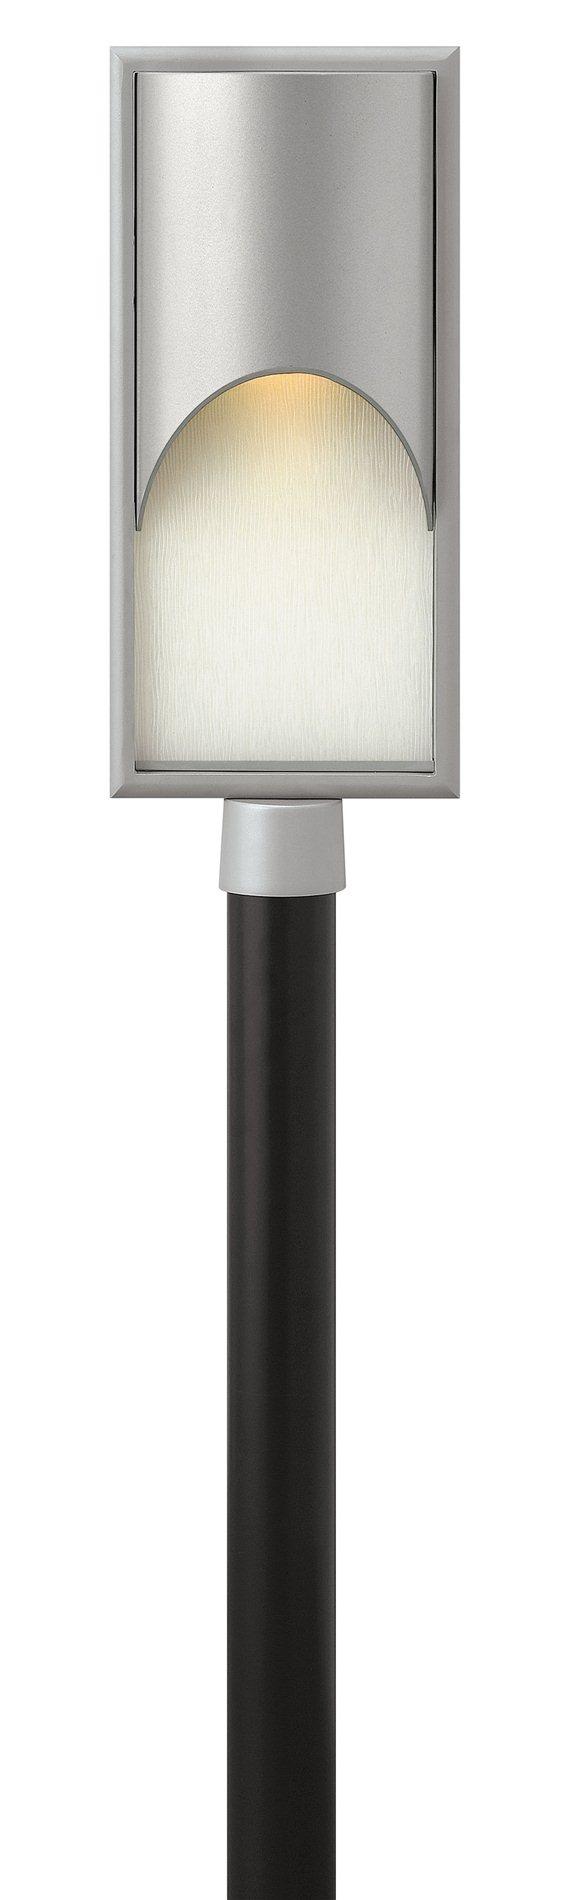 Hinkley lighting 1831tt cascade outdoor post top pier for Best landscape lighting brands